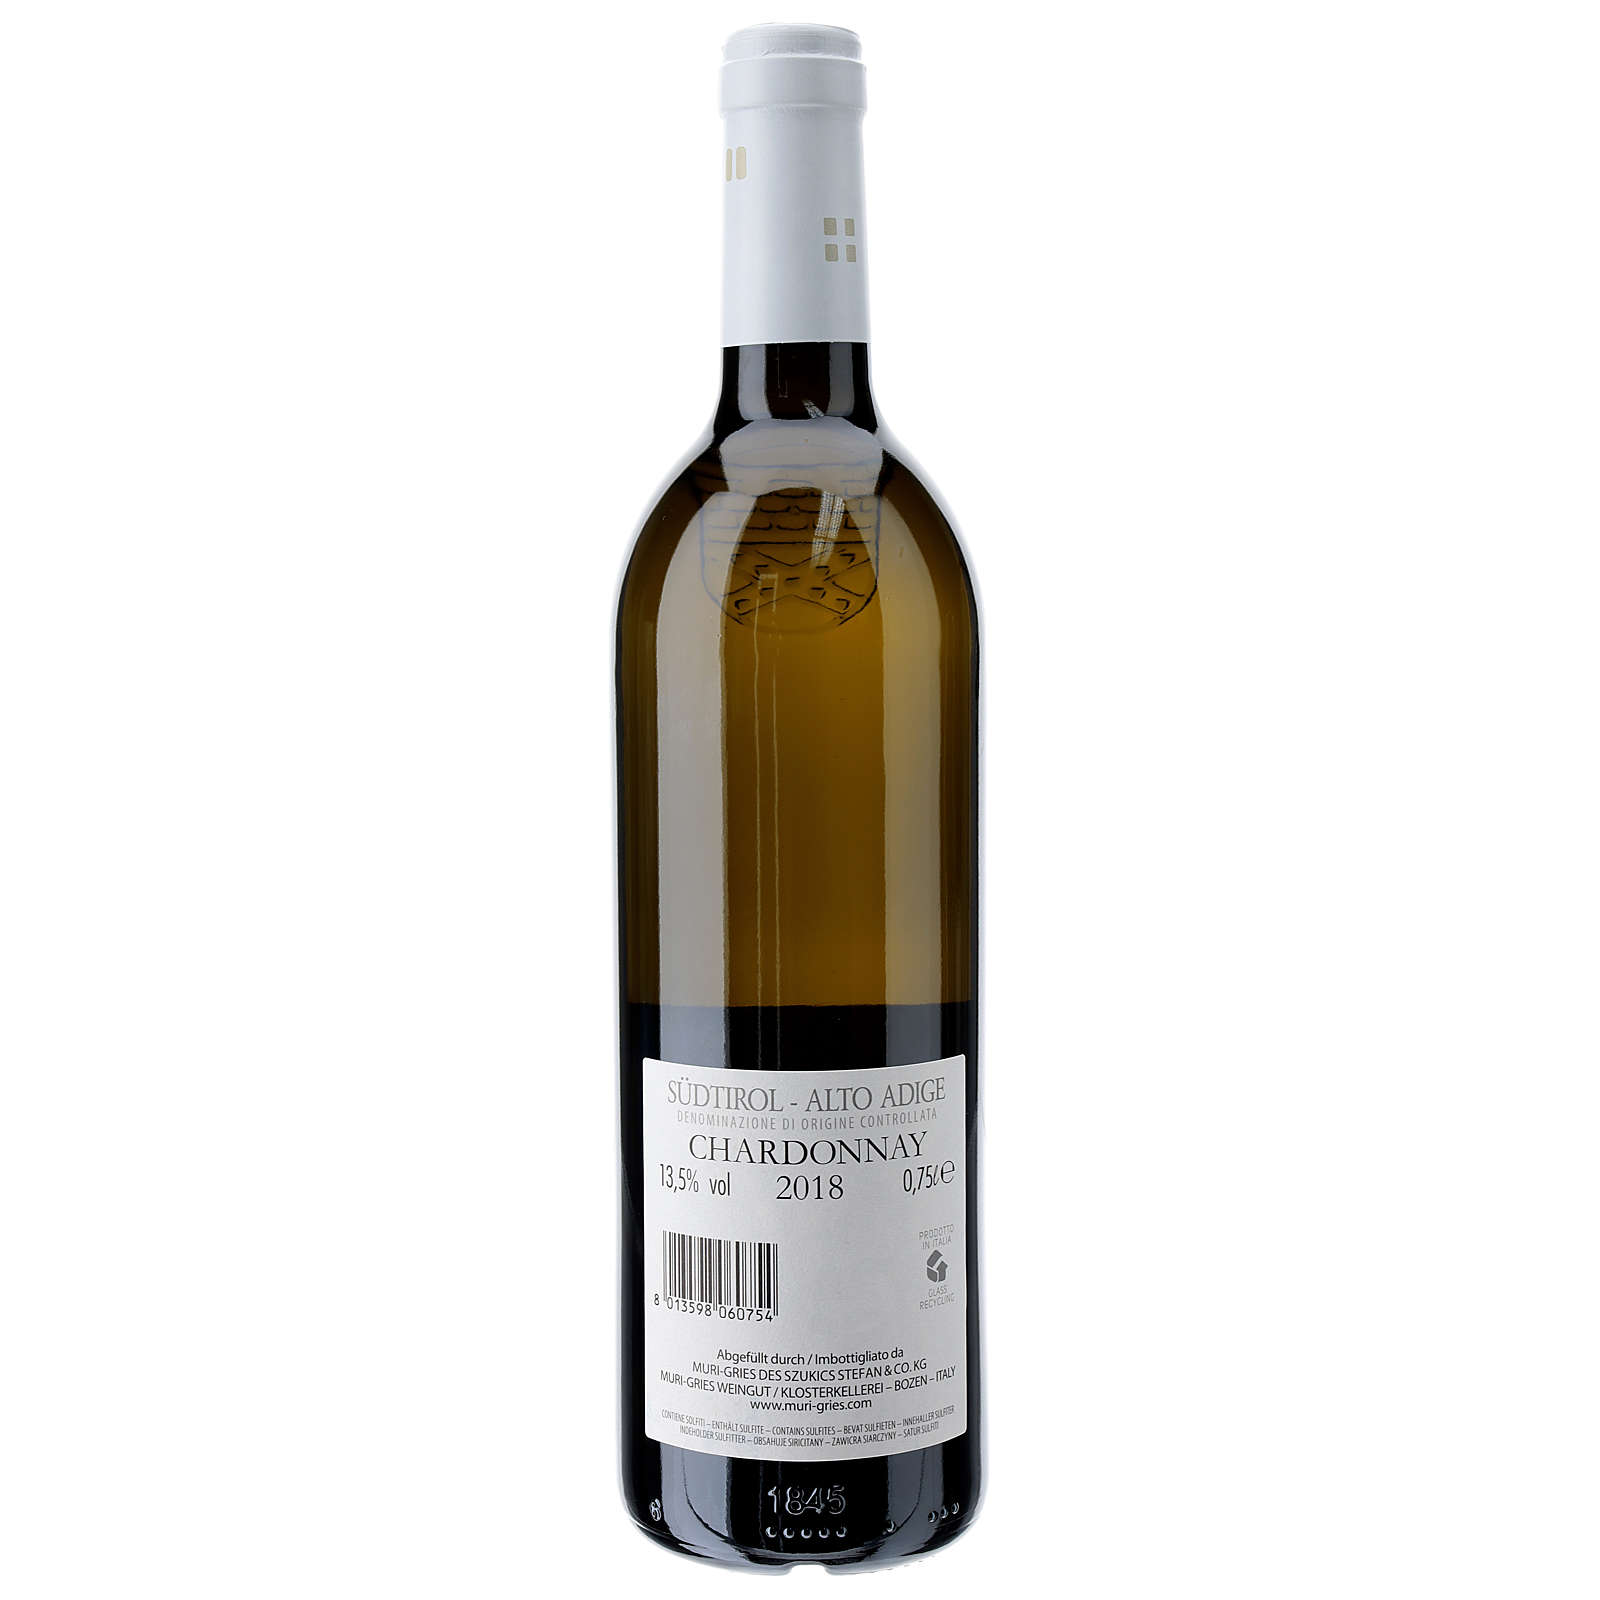 Vinho Chardonnay DOC 2018 Abadia Muri Gries 750 ml 3